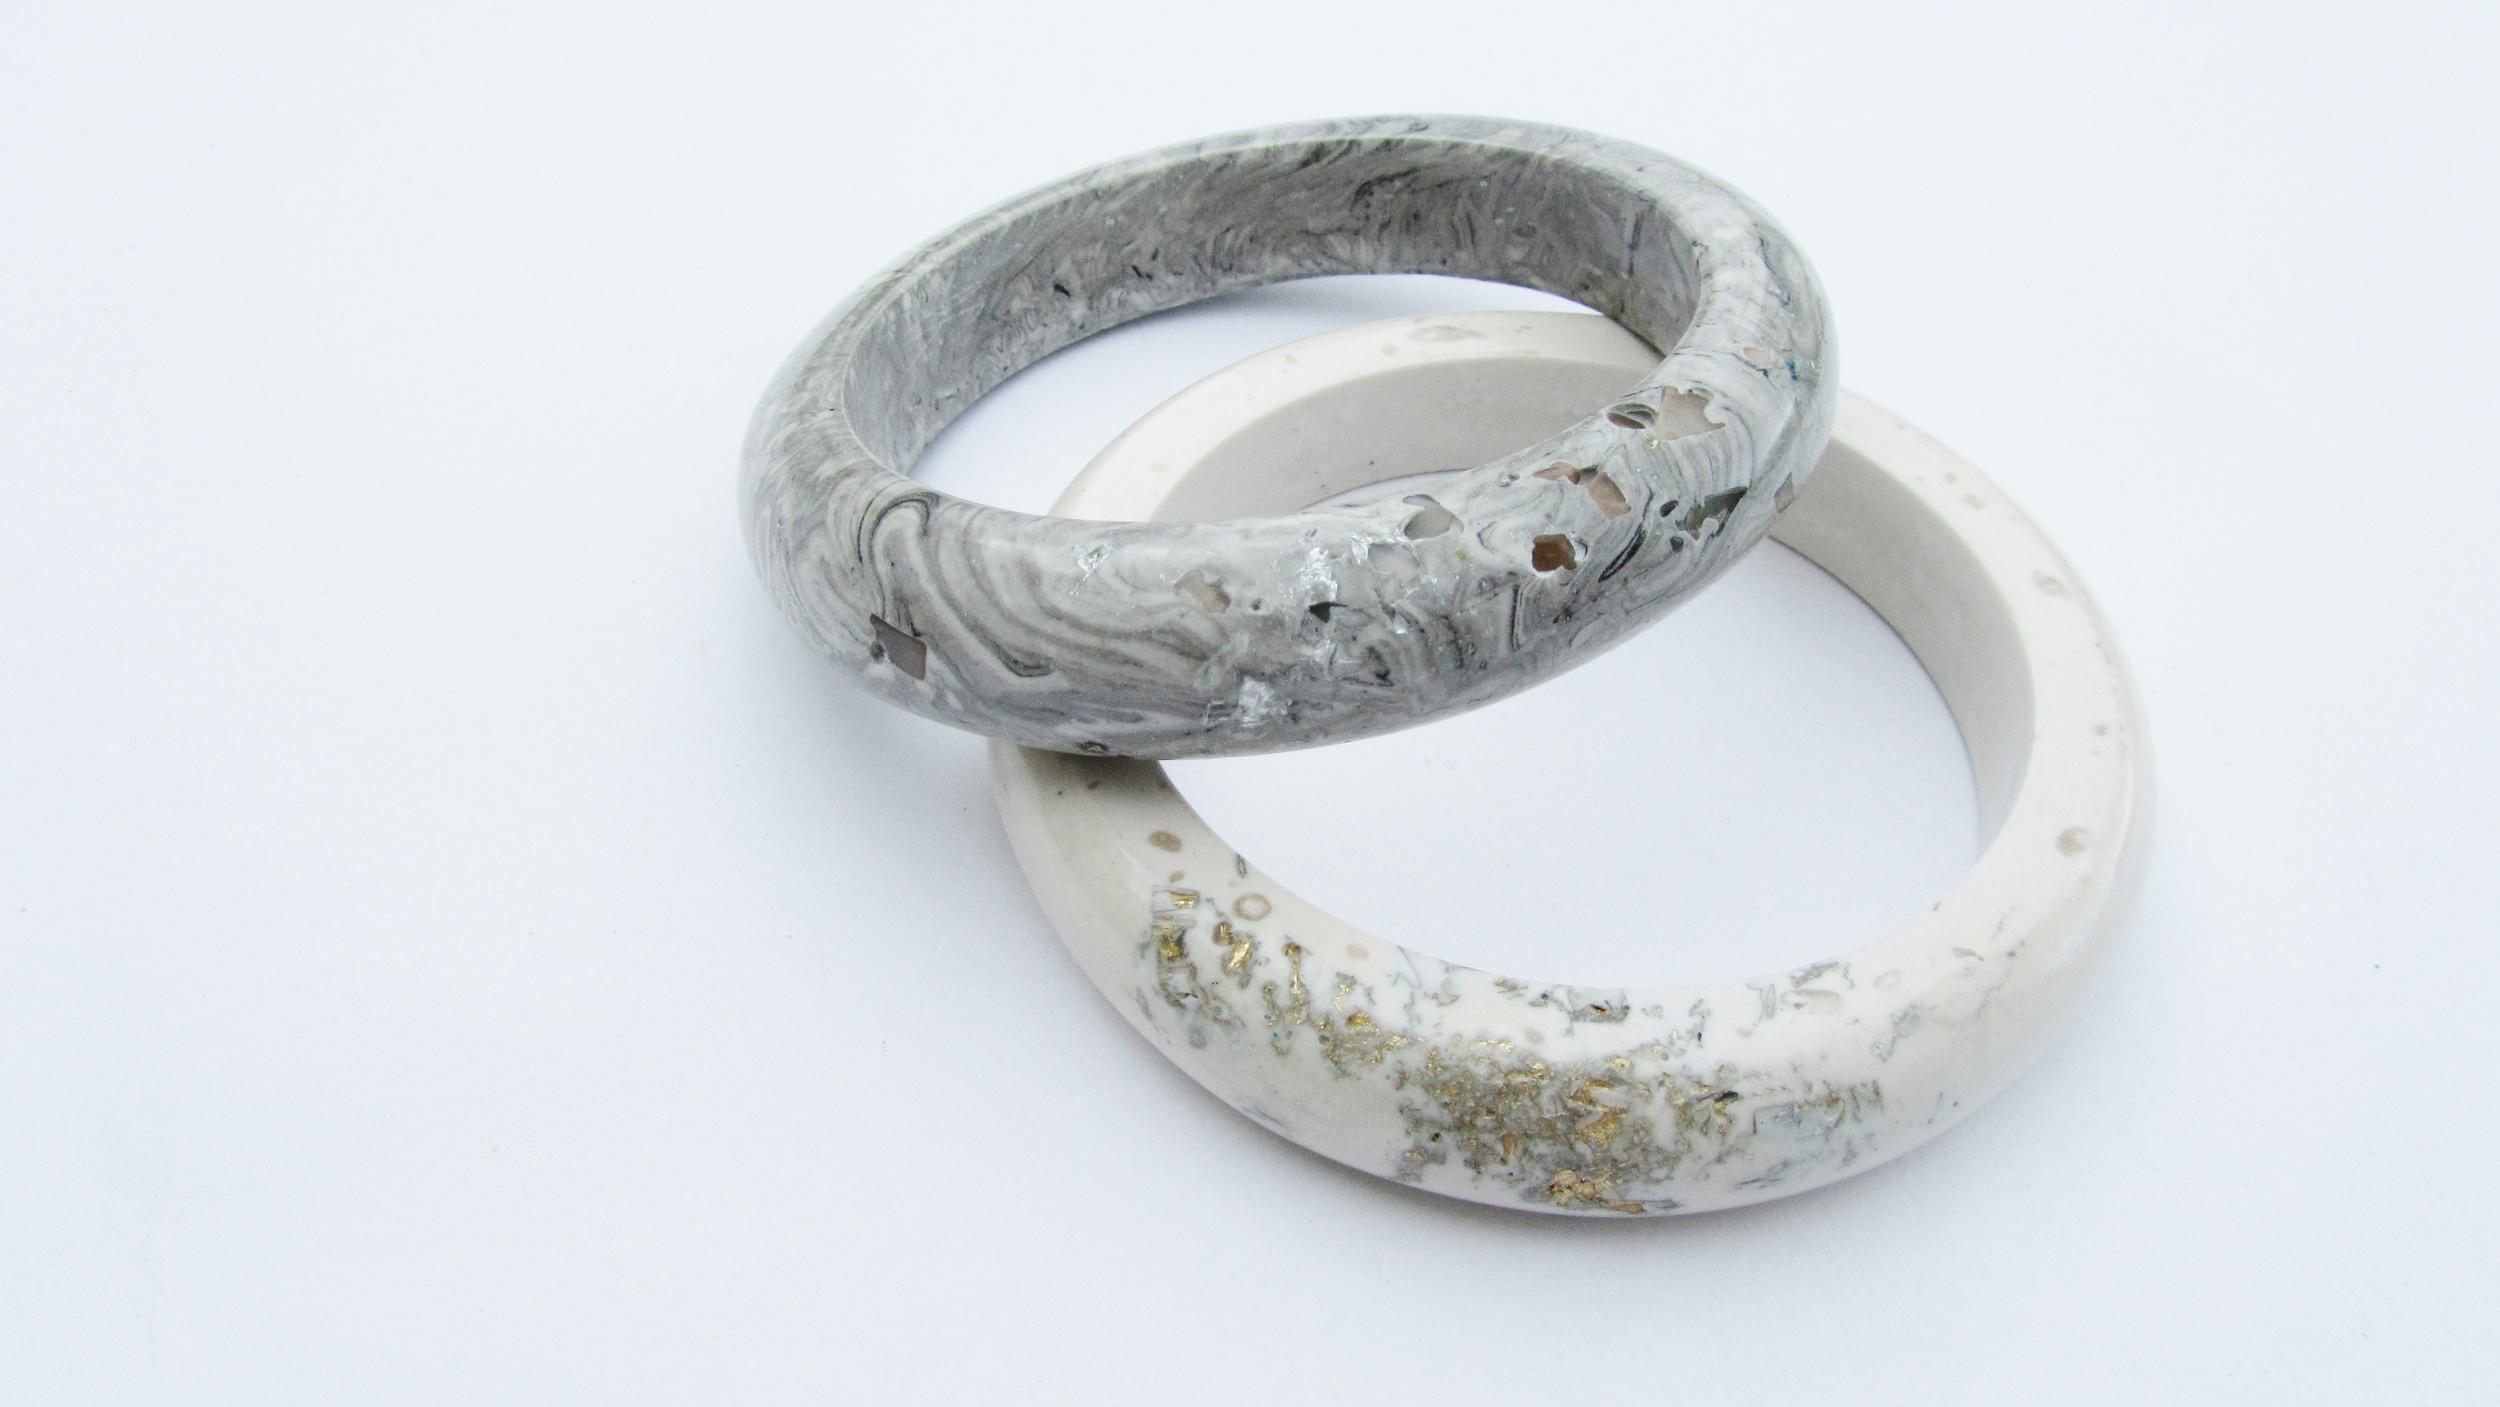 jade mellor hewn bangles grey marbled white gold.JPG